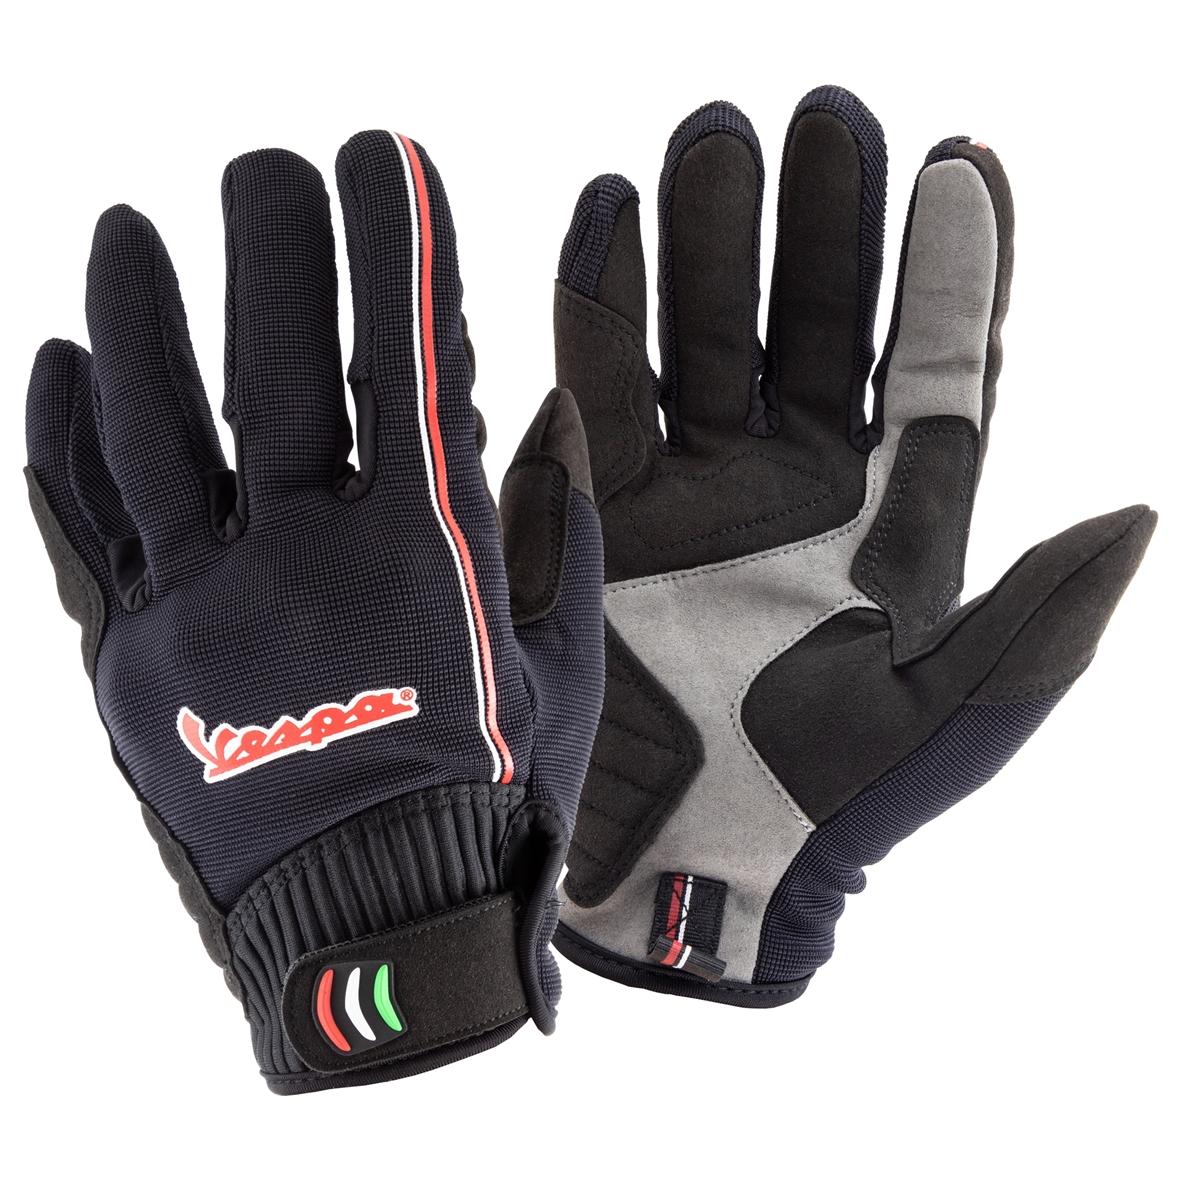 Product Image for 'Gloves PIAGGIO Vespa Modernist size LTitle'